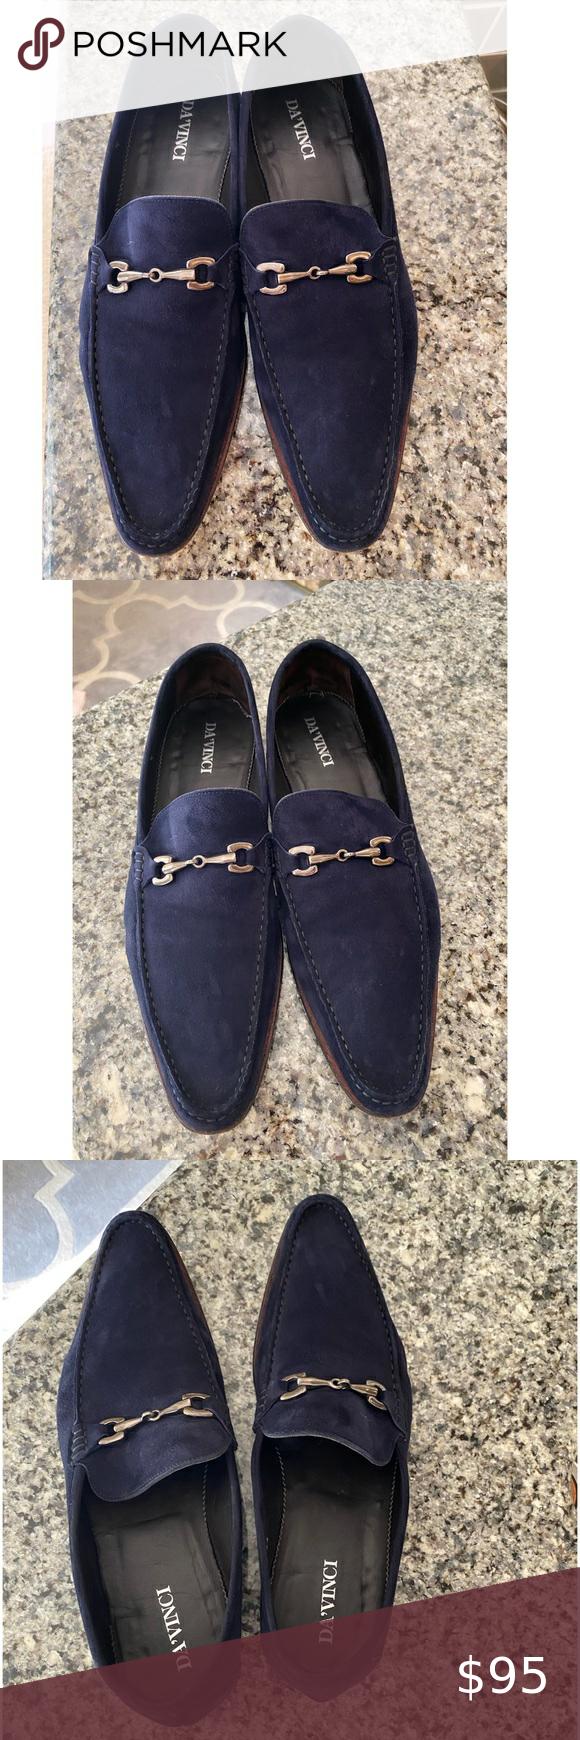 DaVinci Suede-leather loafers dress